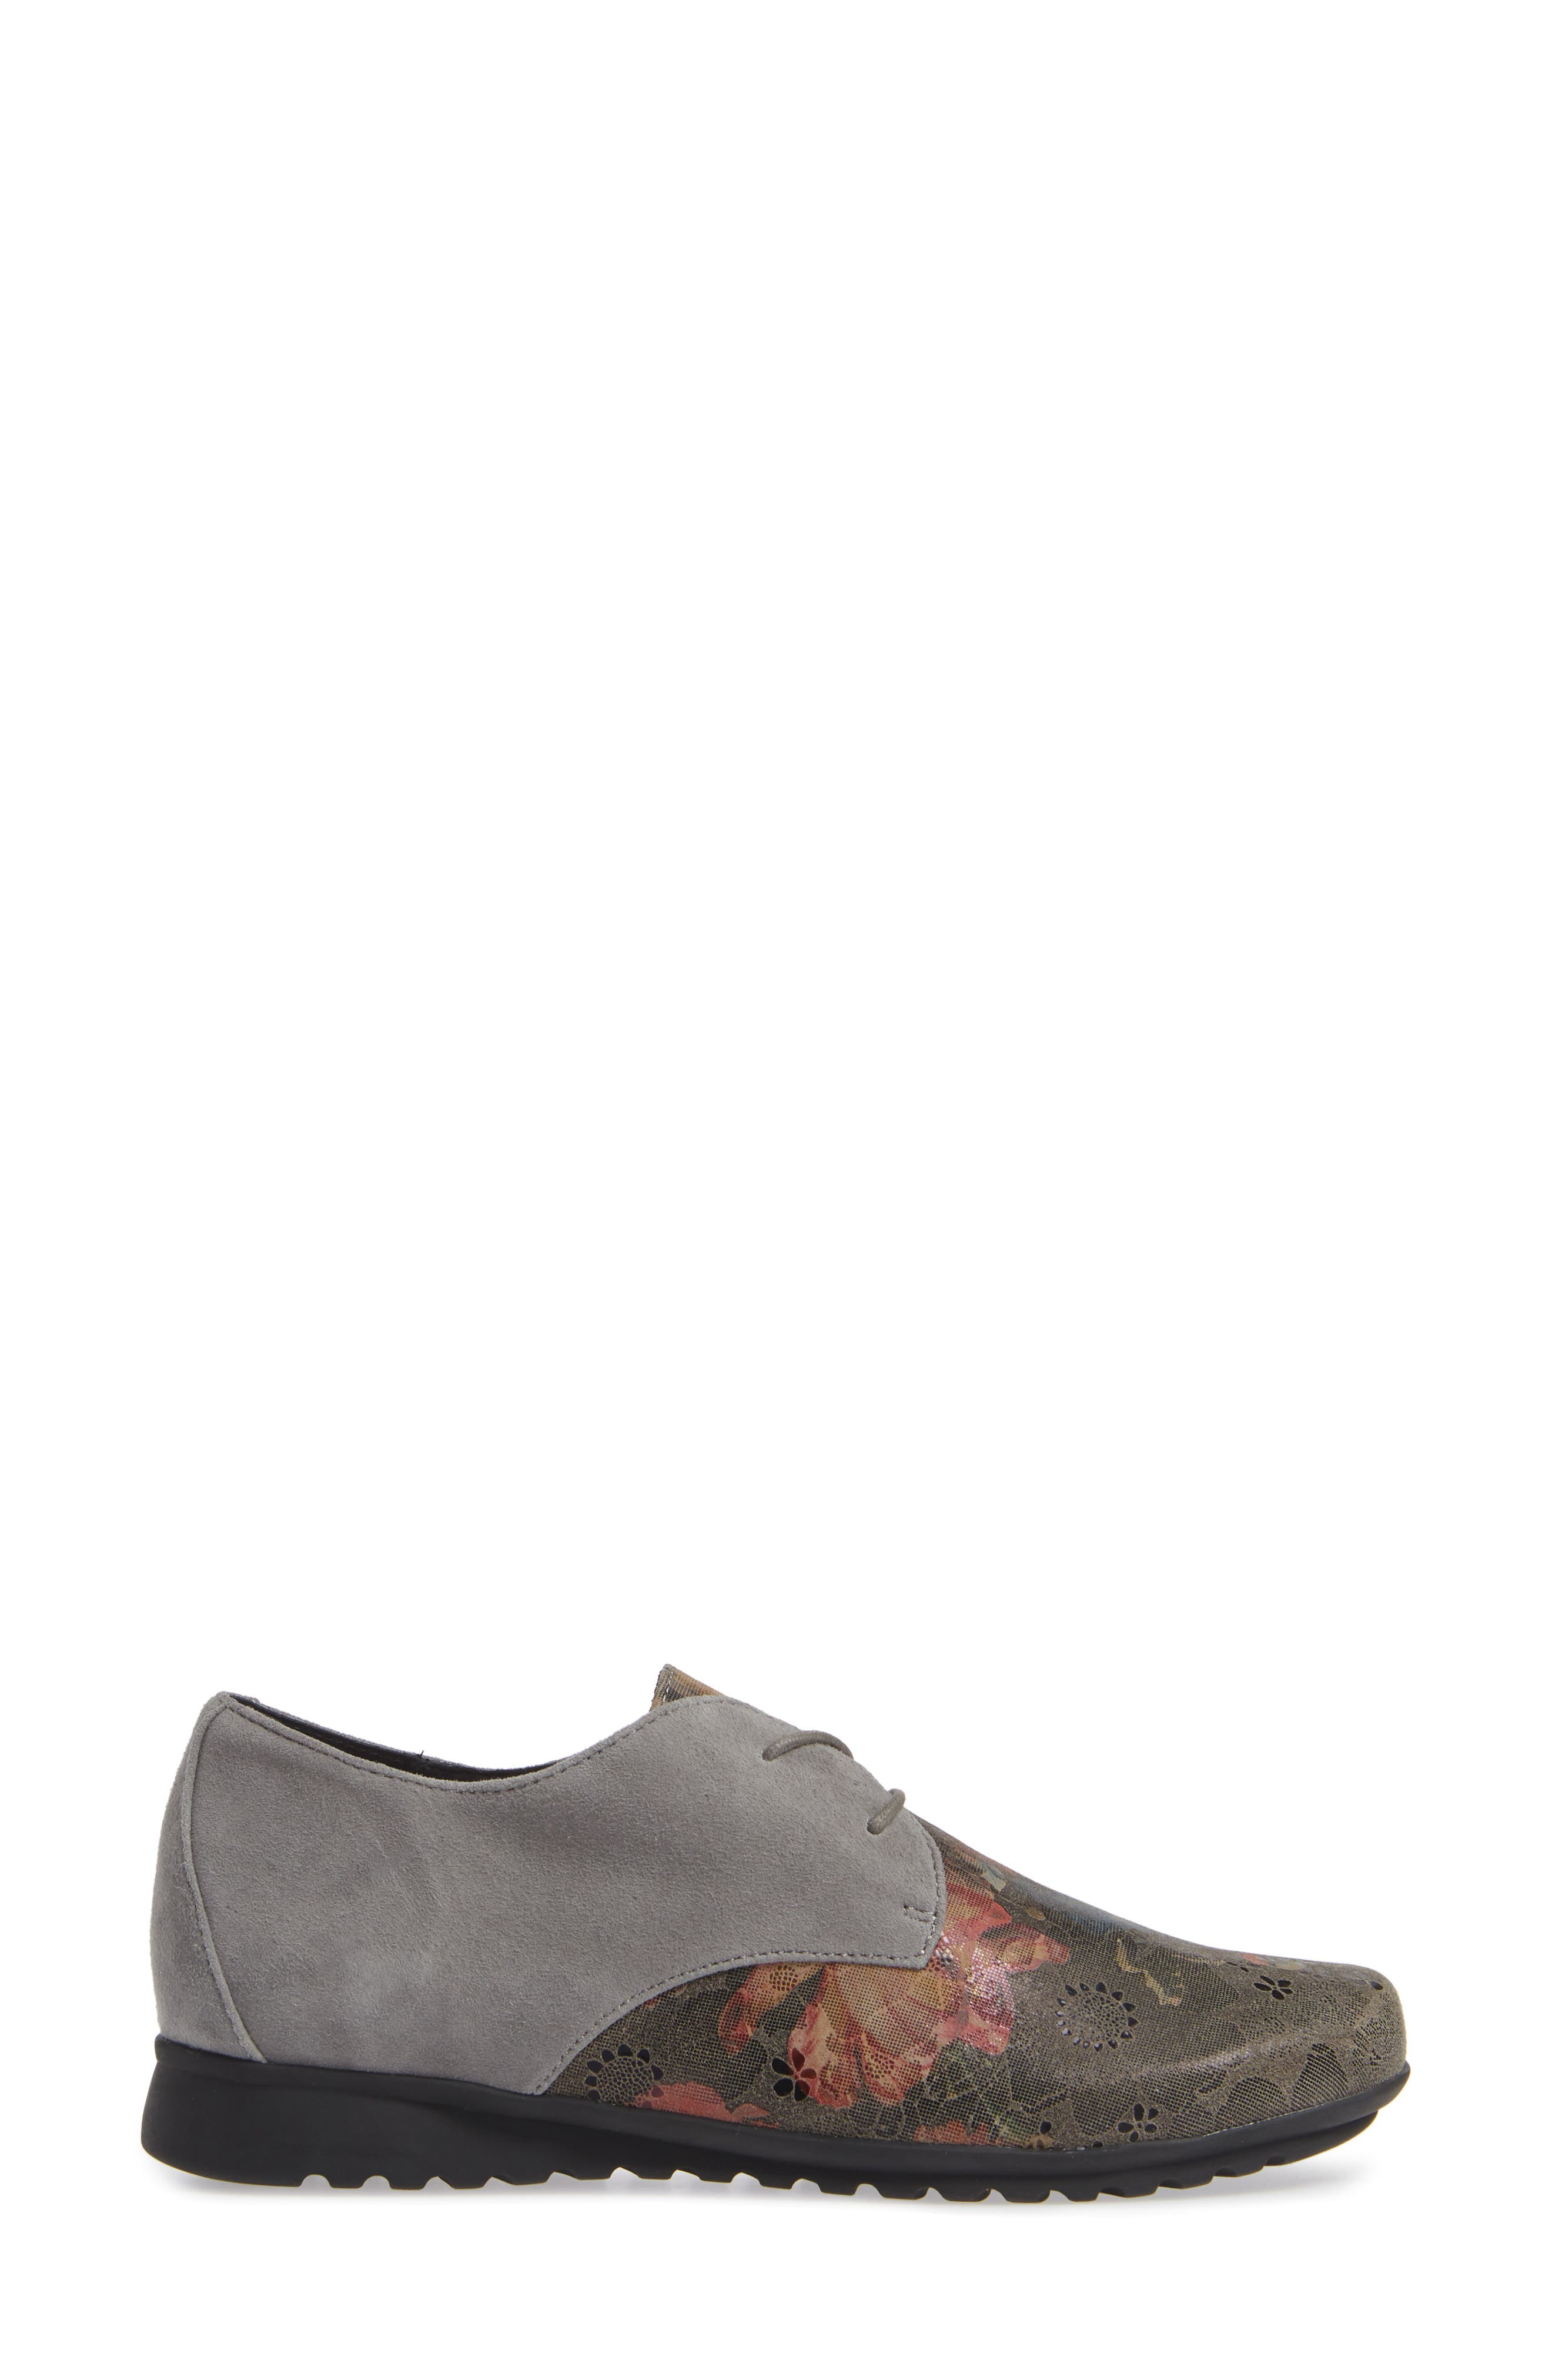 AETREX, Erin Saddle Shoe, Alternate thumbnail 3, color, CHARCOAL LEATHER